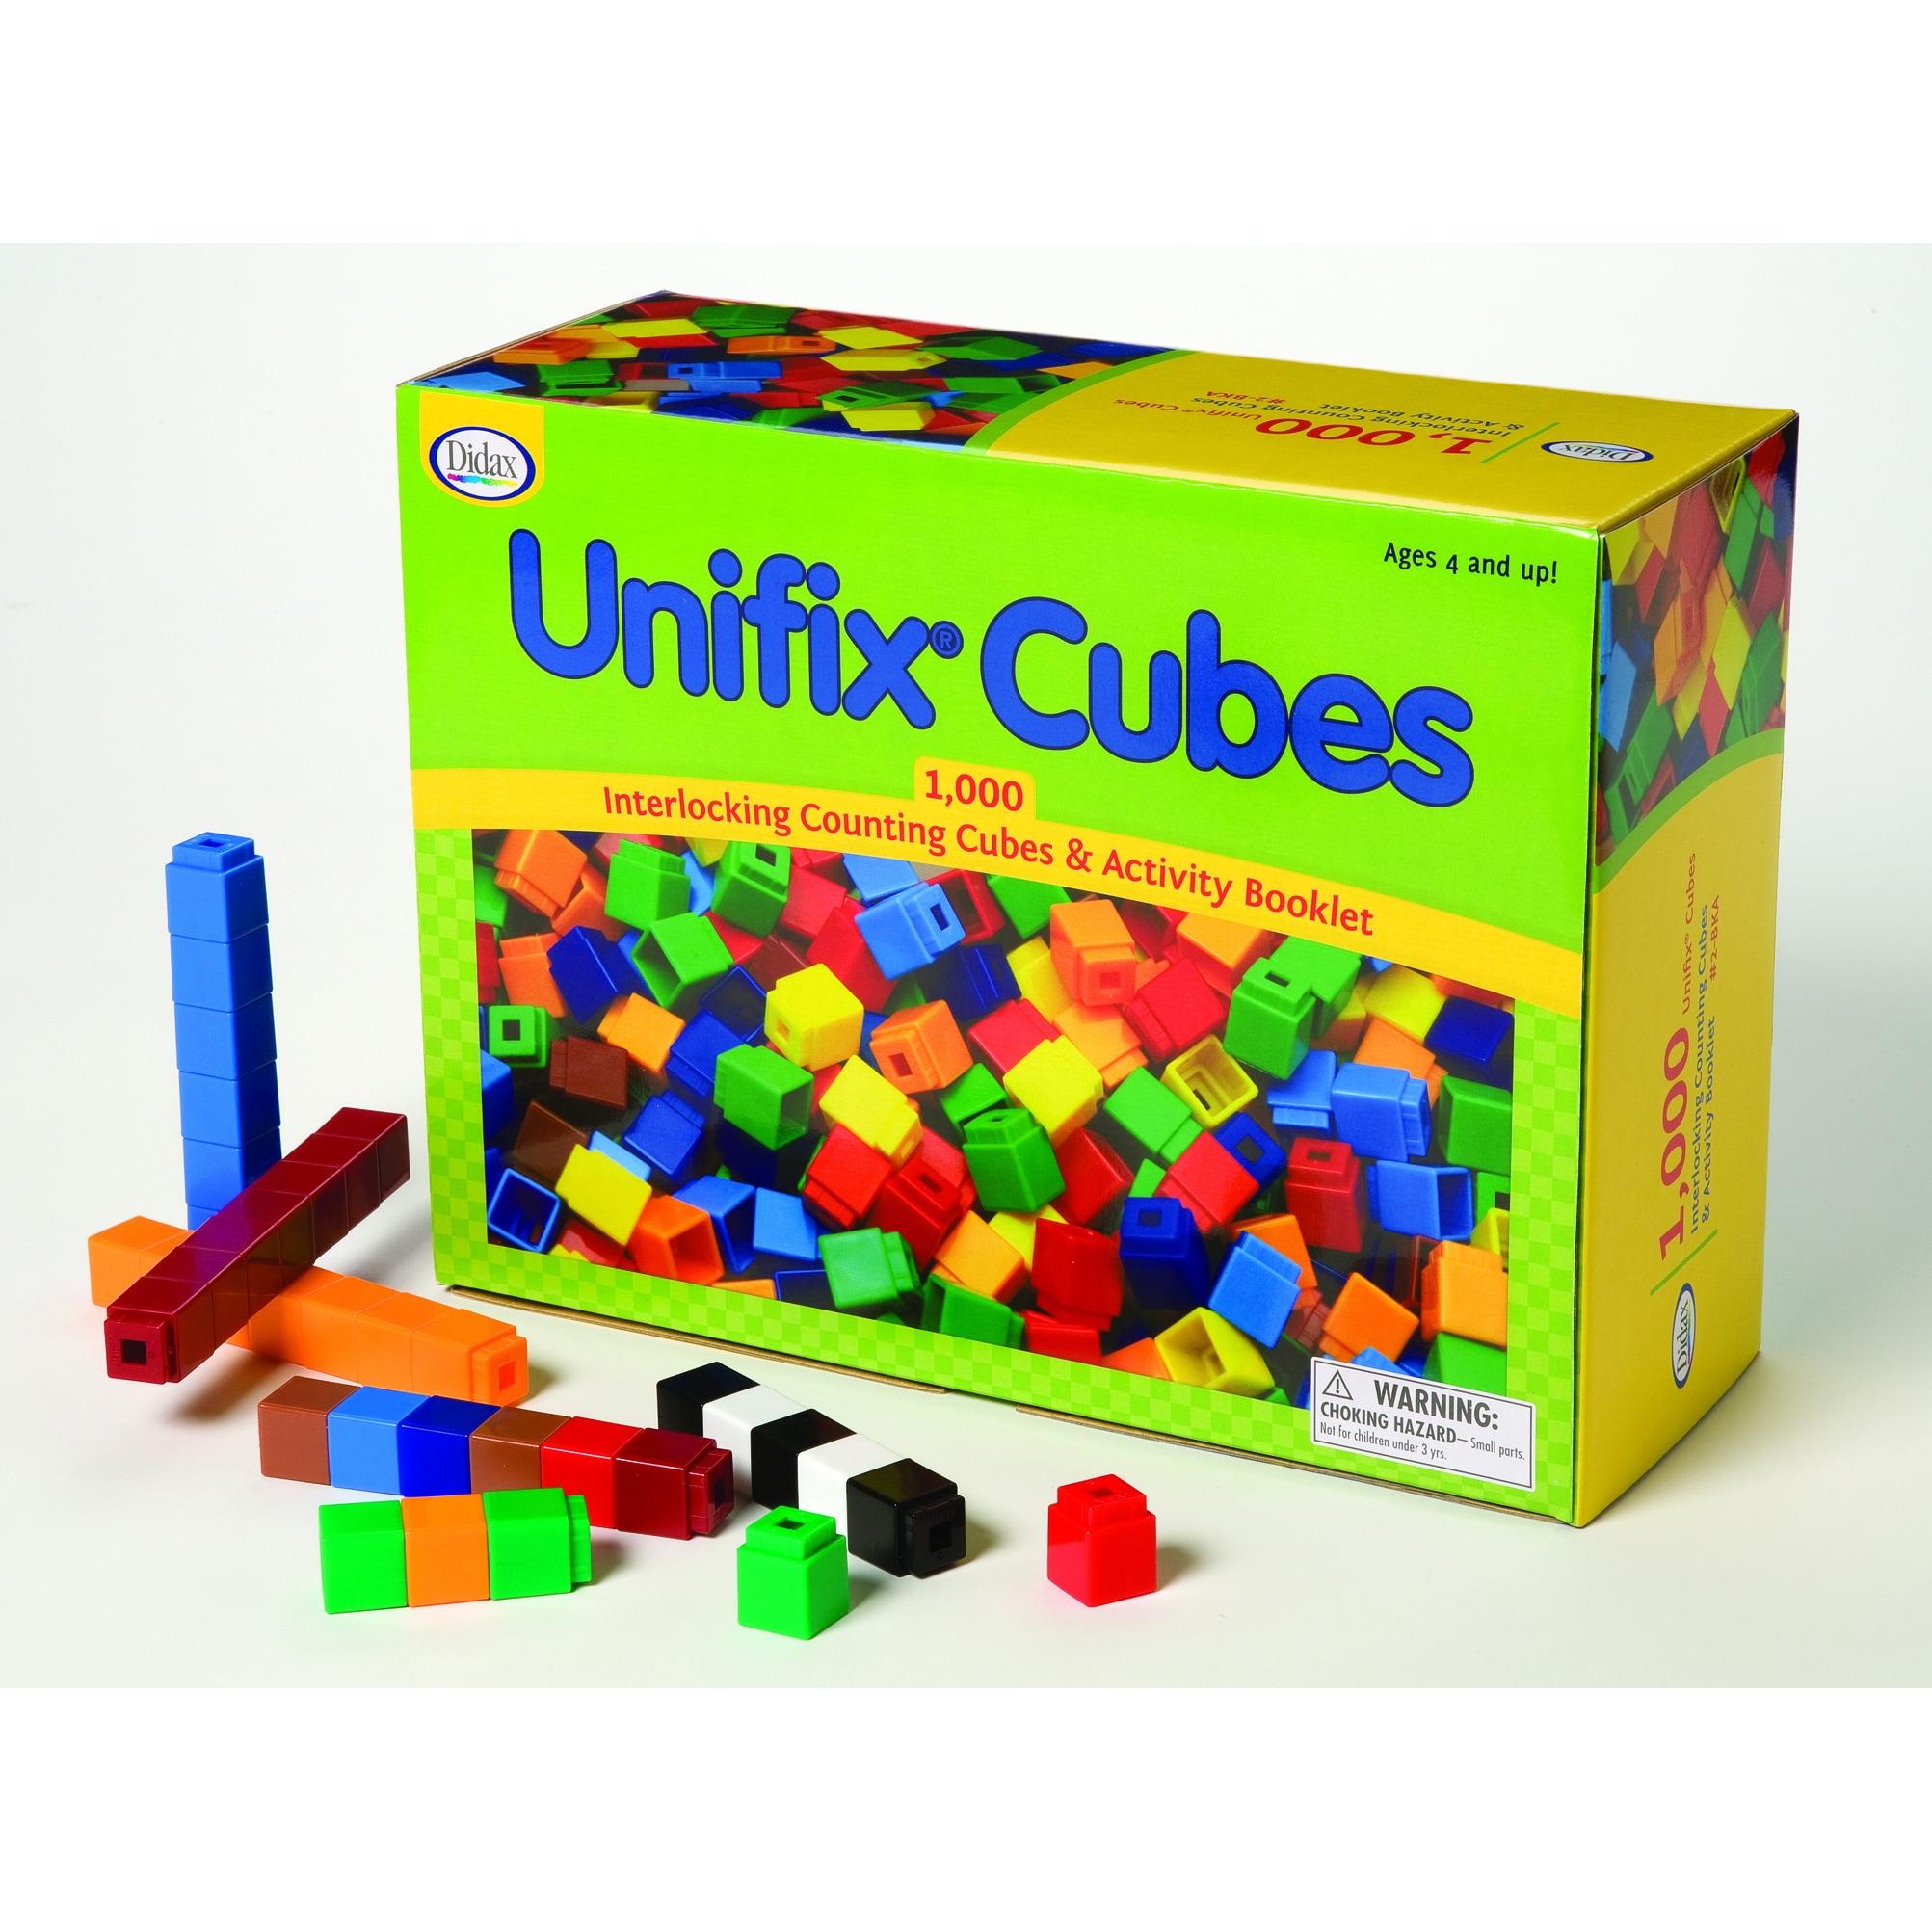 DIDAX Unifix Cube Set (Package of 1000) (Unifix Cube Set)